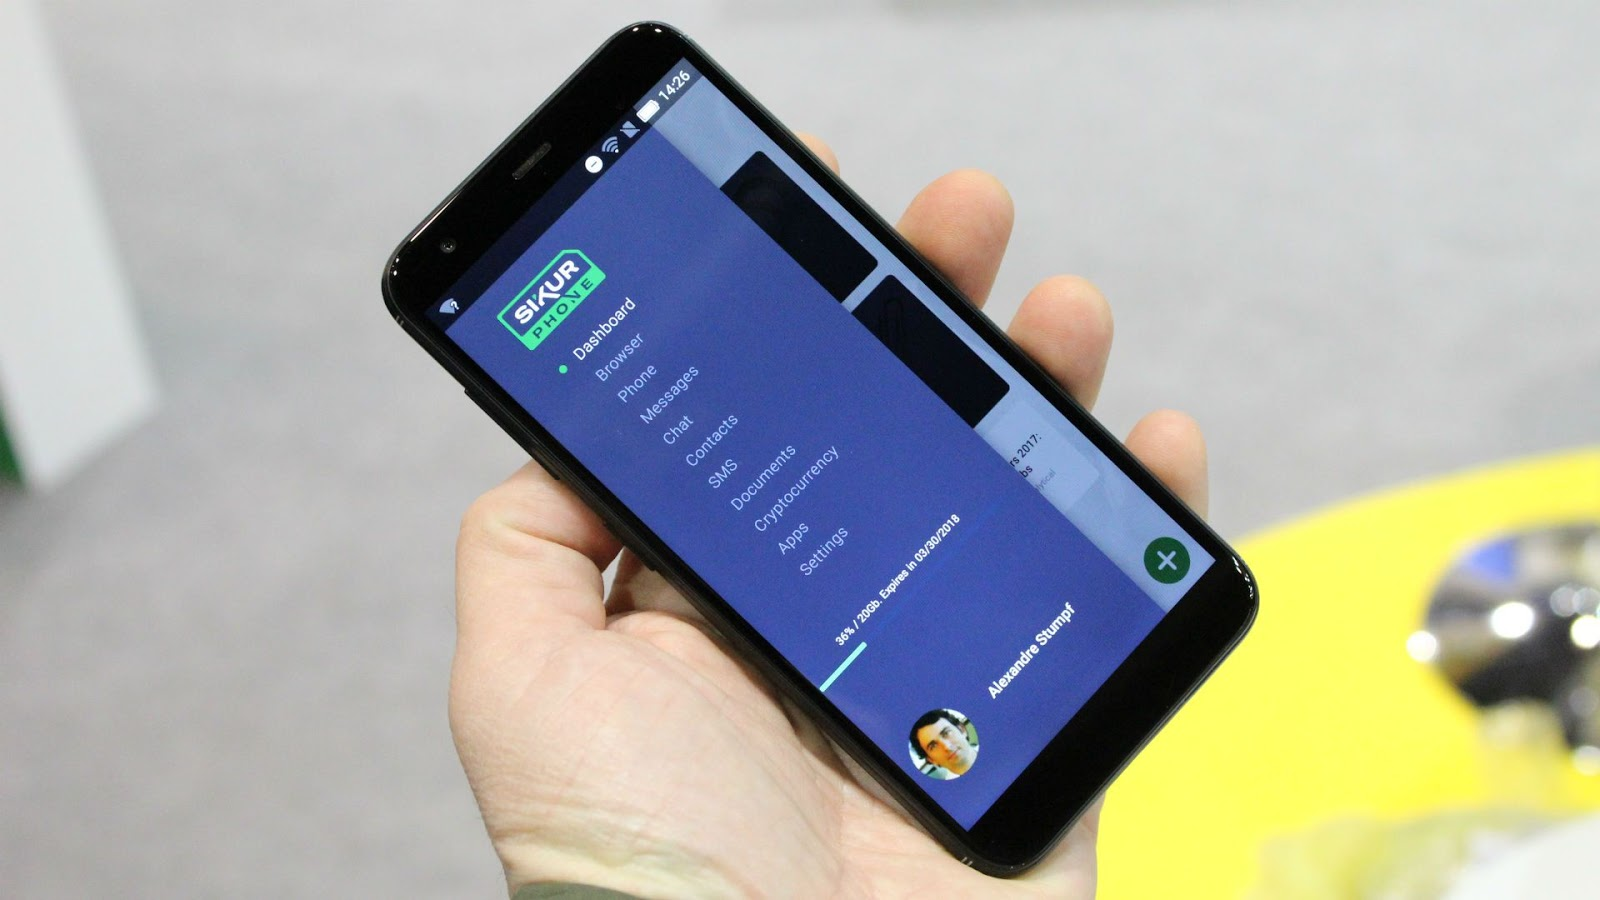 billetera-blockchain-mwc 2018-criptomonedas-sikur-brasil